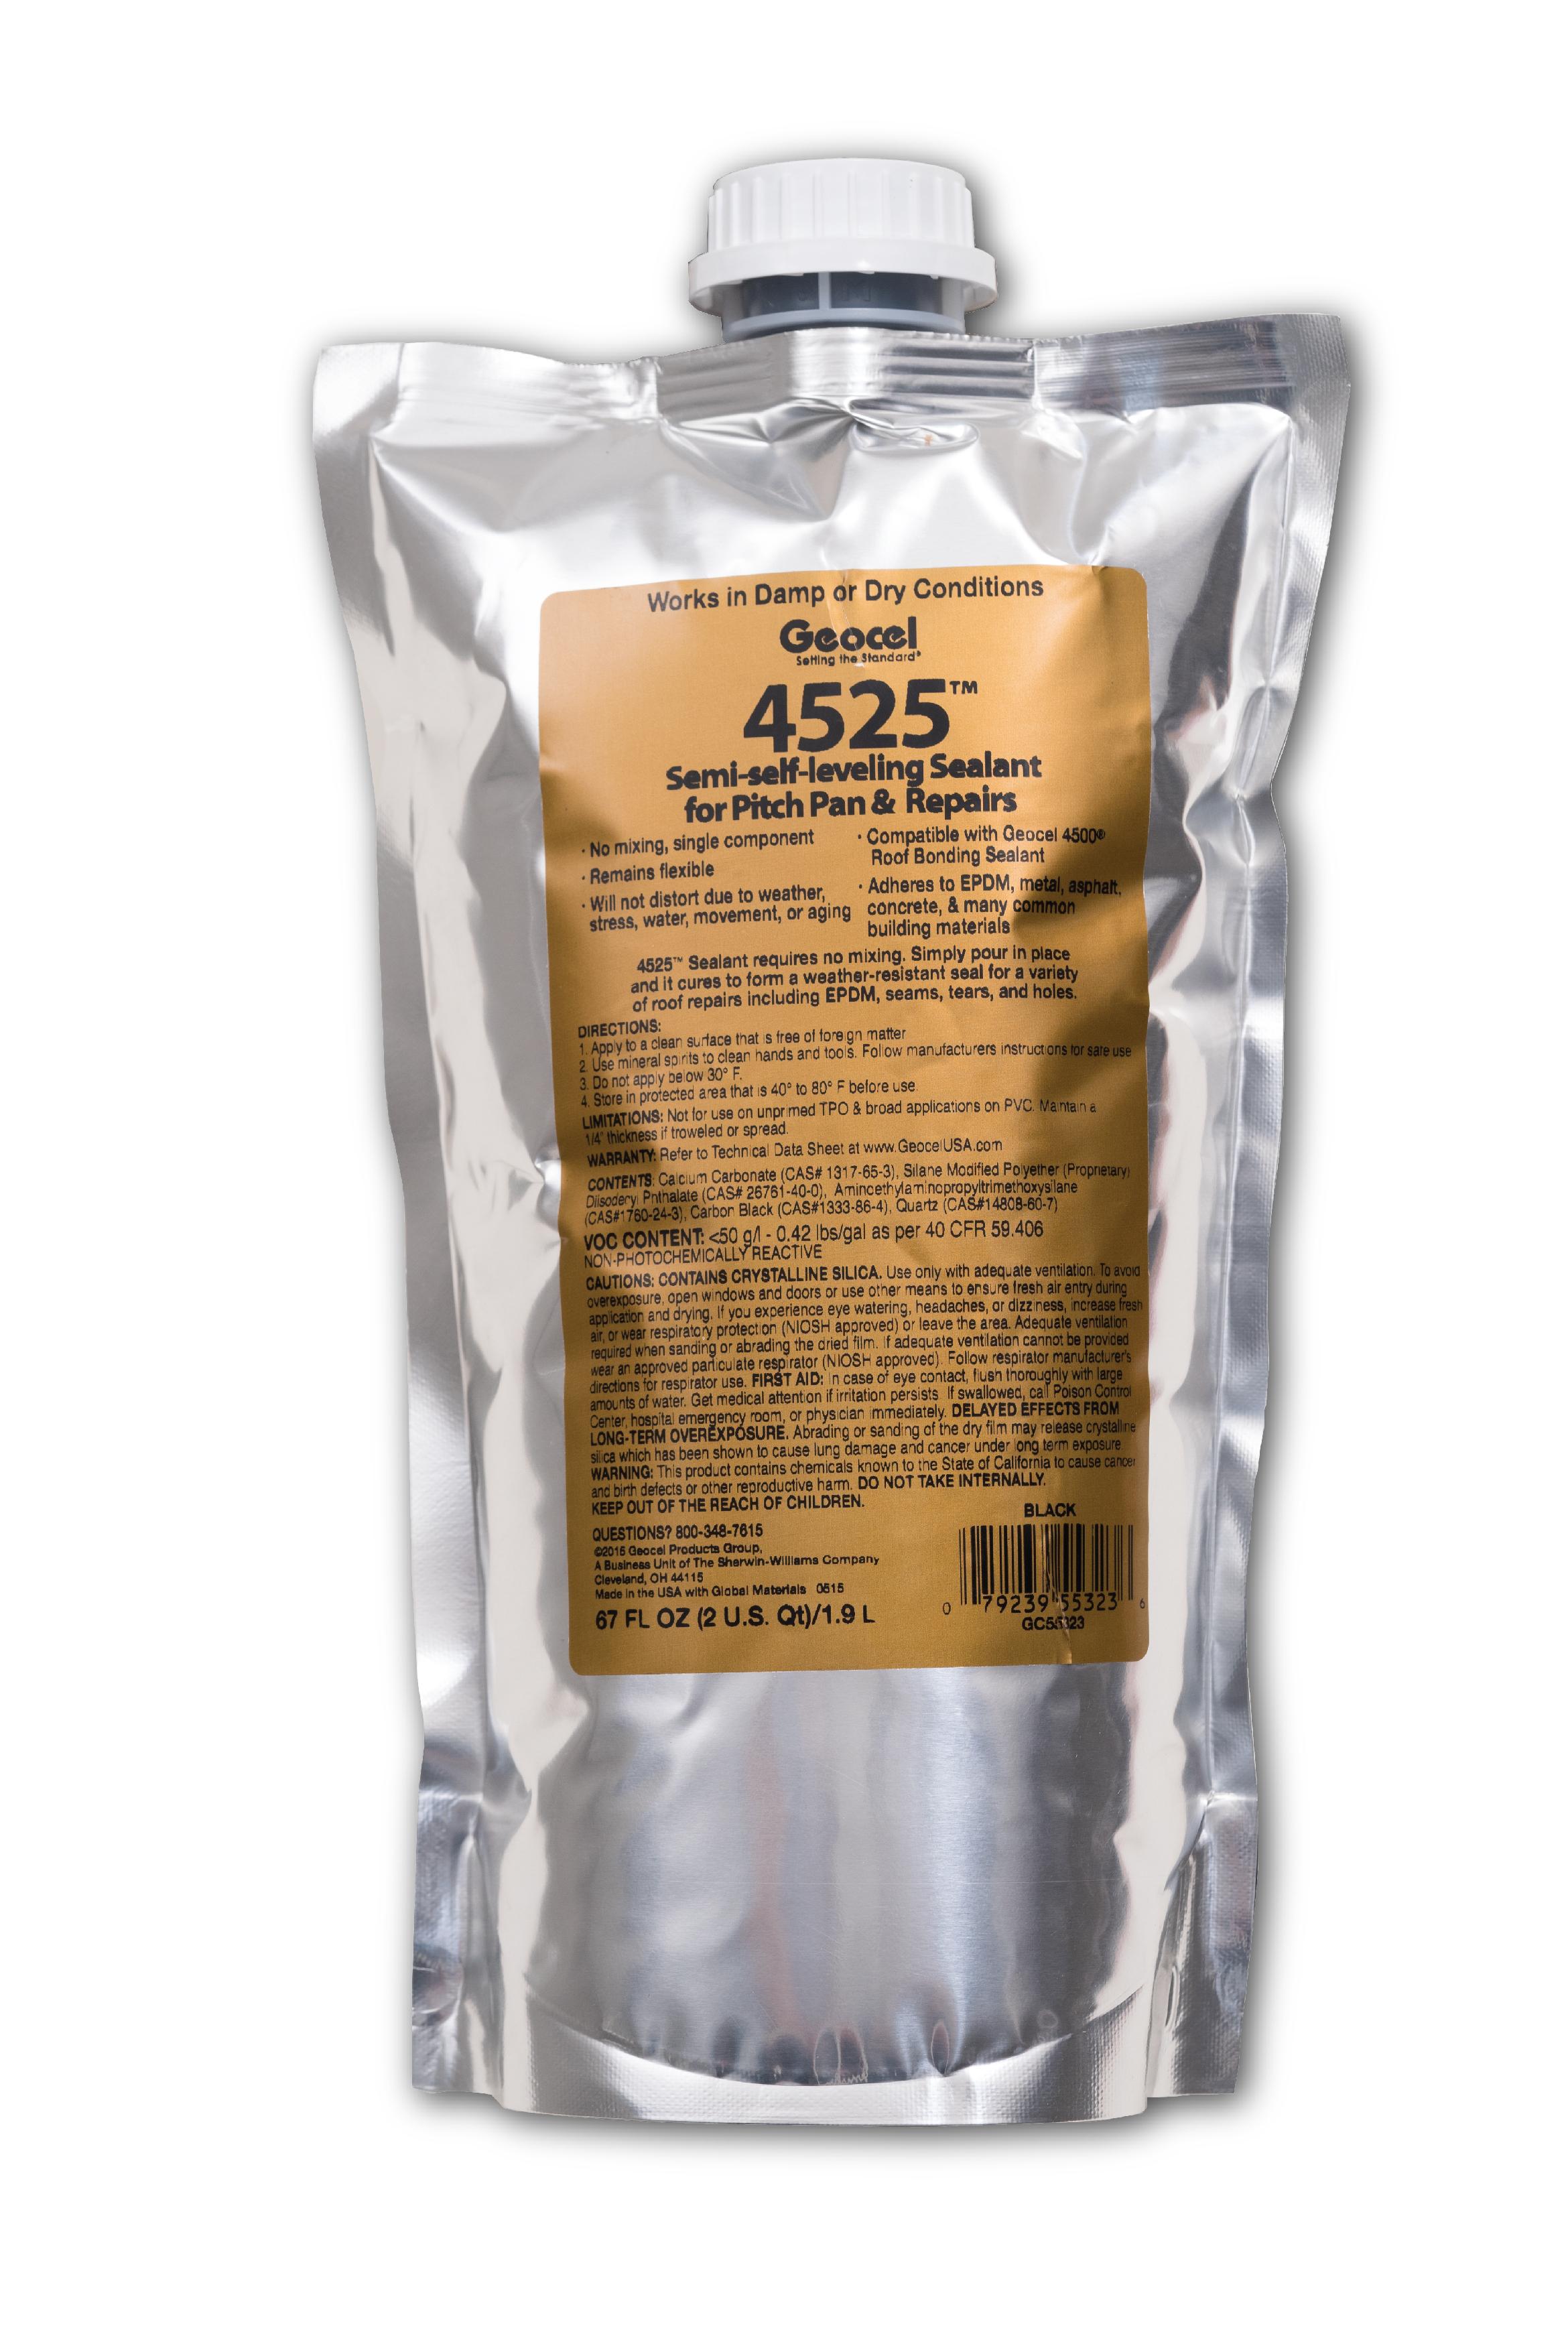 4525 Semi Self Leveling Sealant Geocel